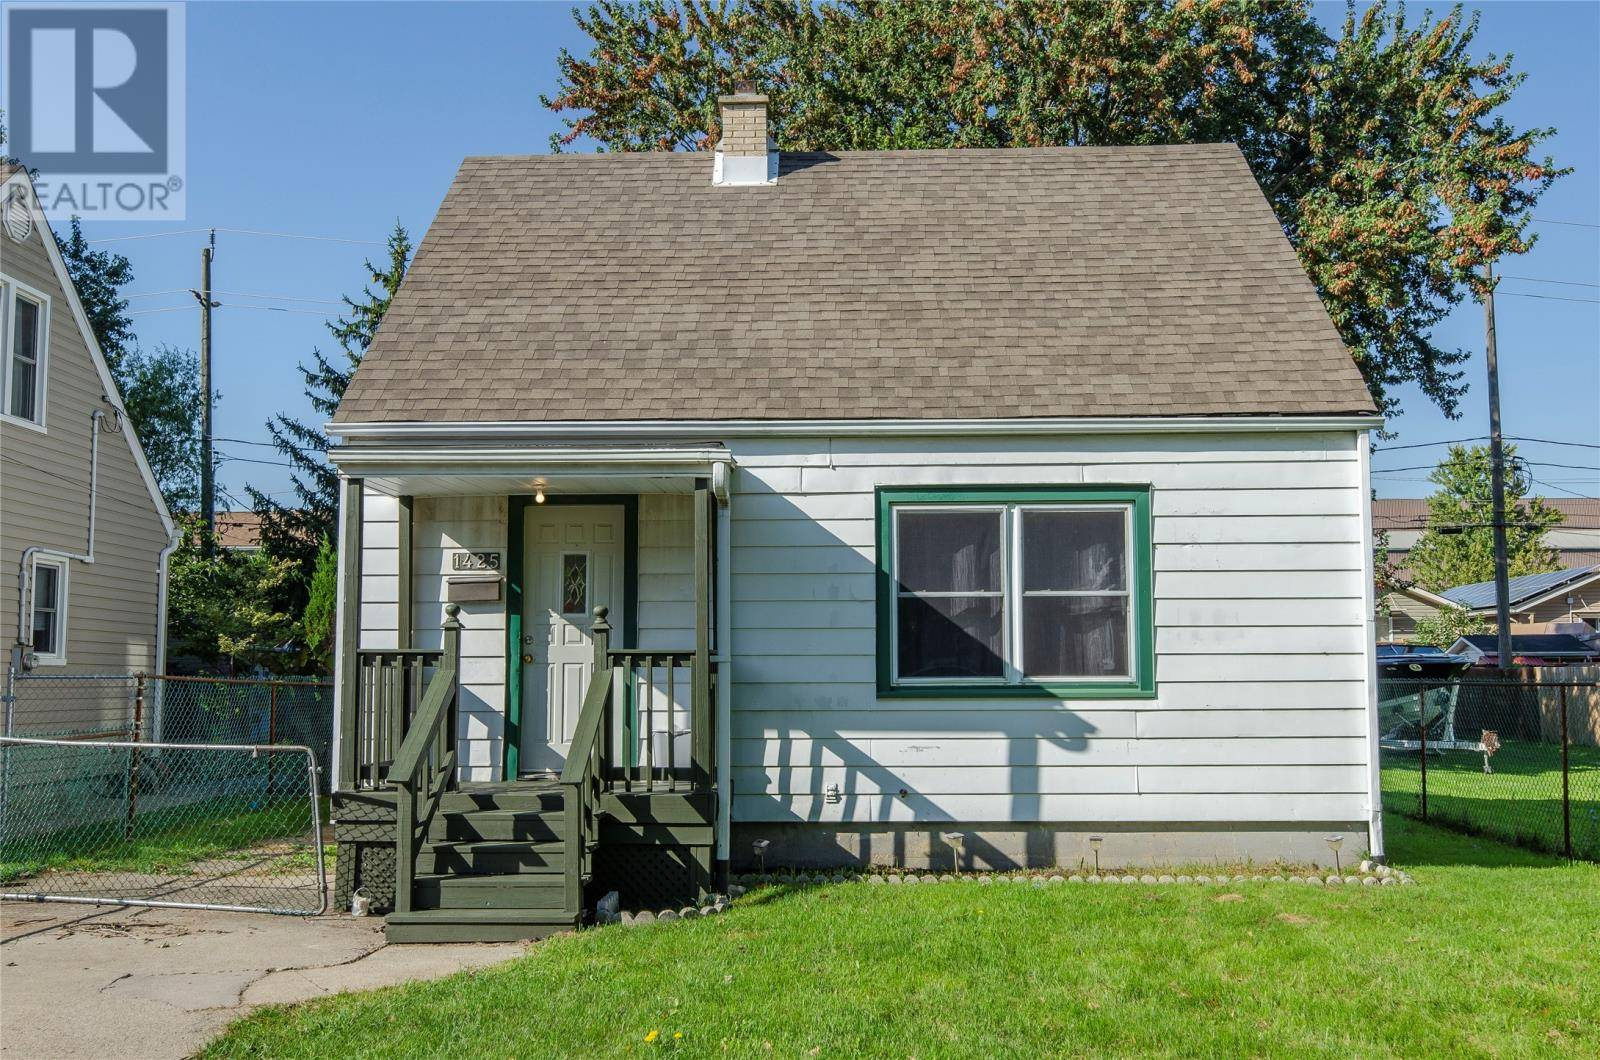 House for sale at 1425 Albert  Windsor Ontario - MLS: 19025807